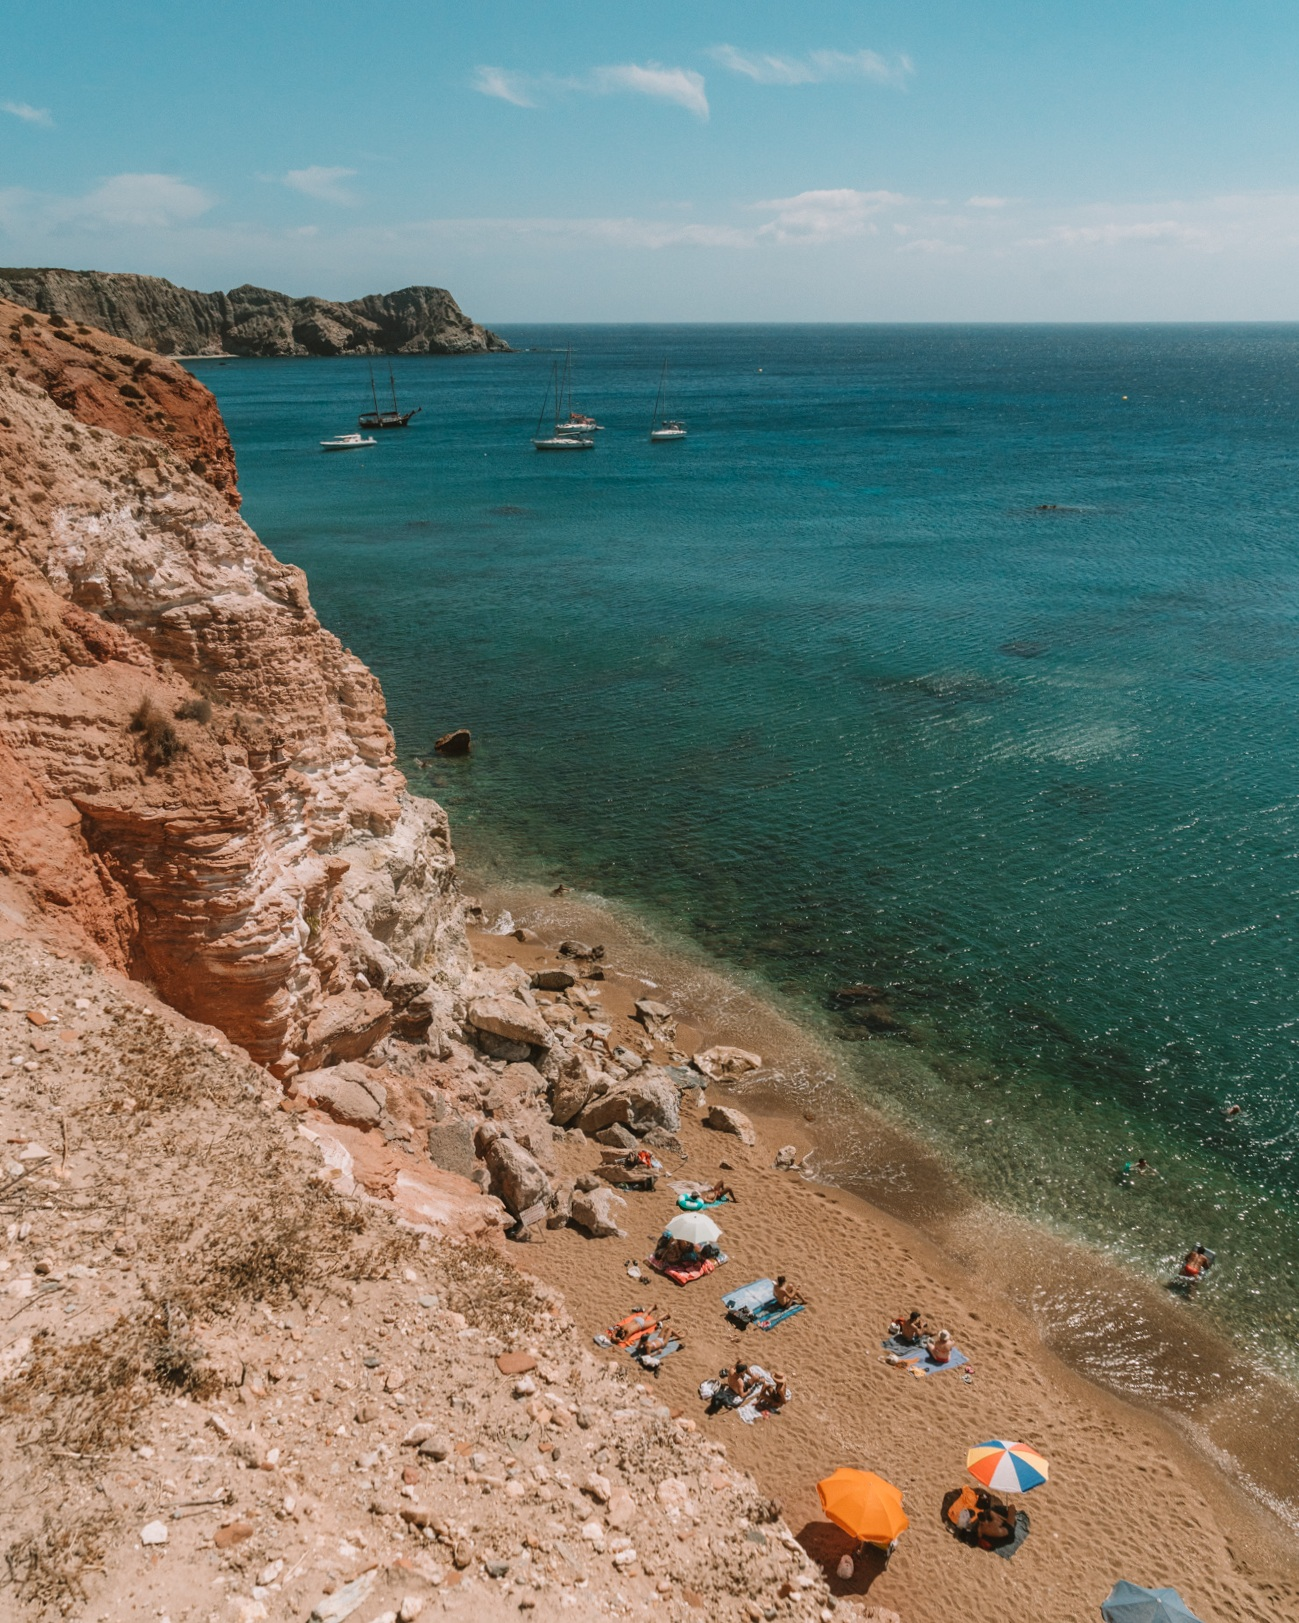 Paliochori+Beach+%286+of+51%29.jpg